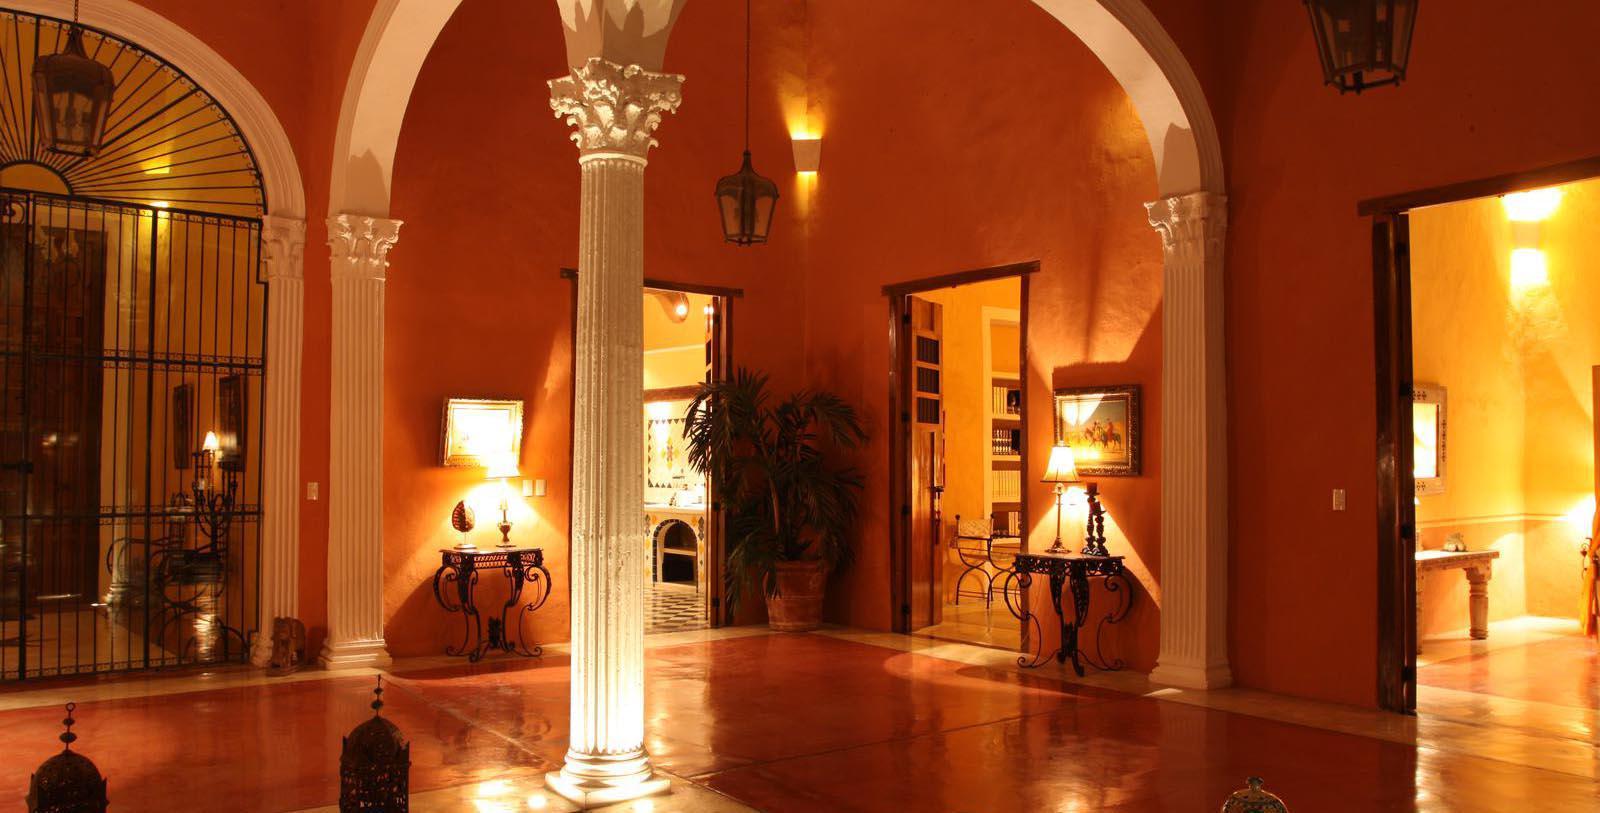 Image of Lobby, Hotel Hacienda Merida, Mexico, 1700s, Member of Historic Hotels Worldwide, Experience